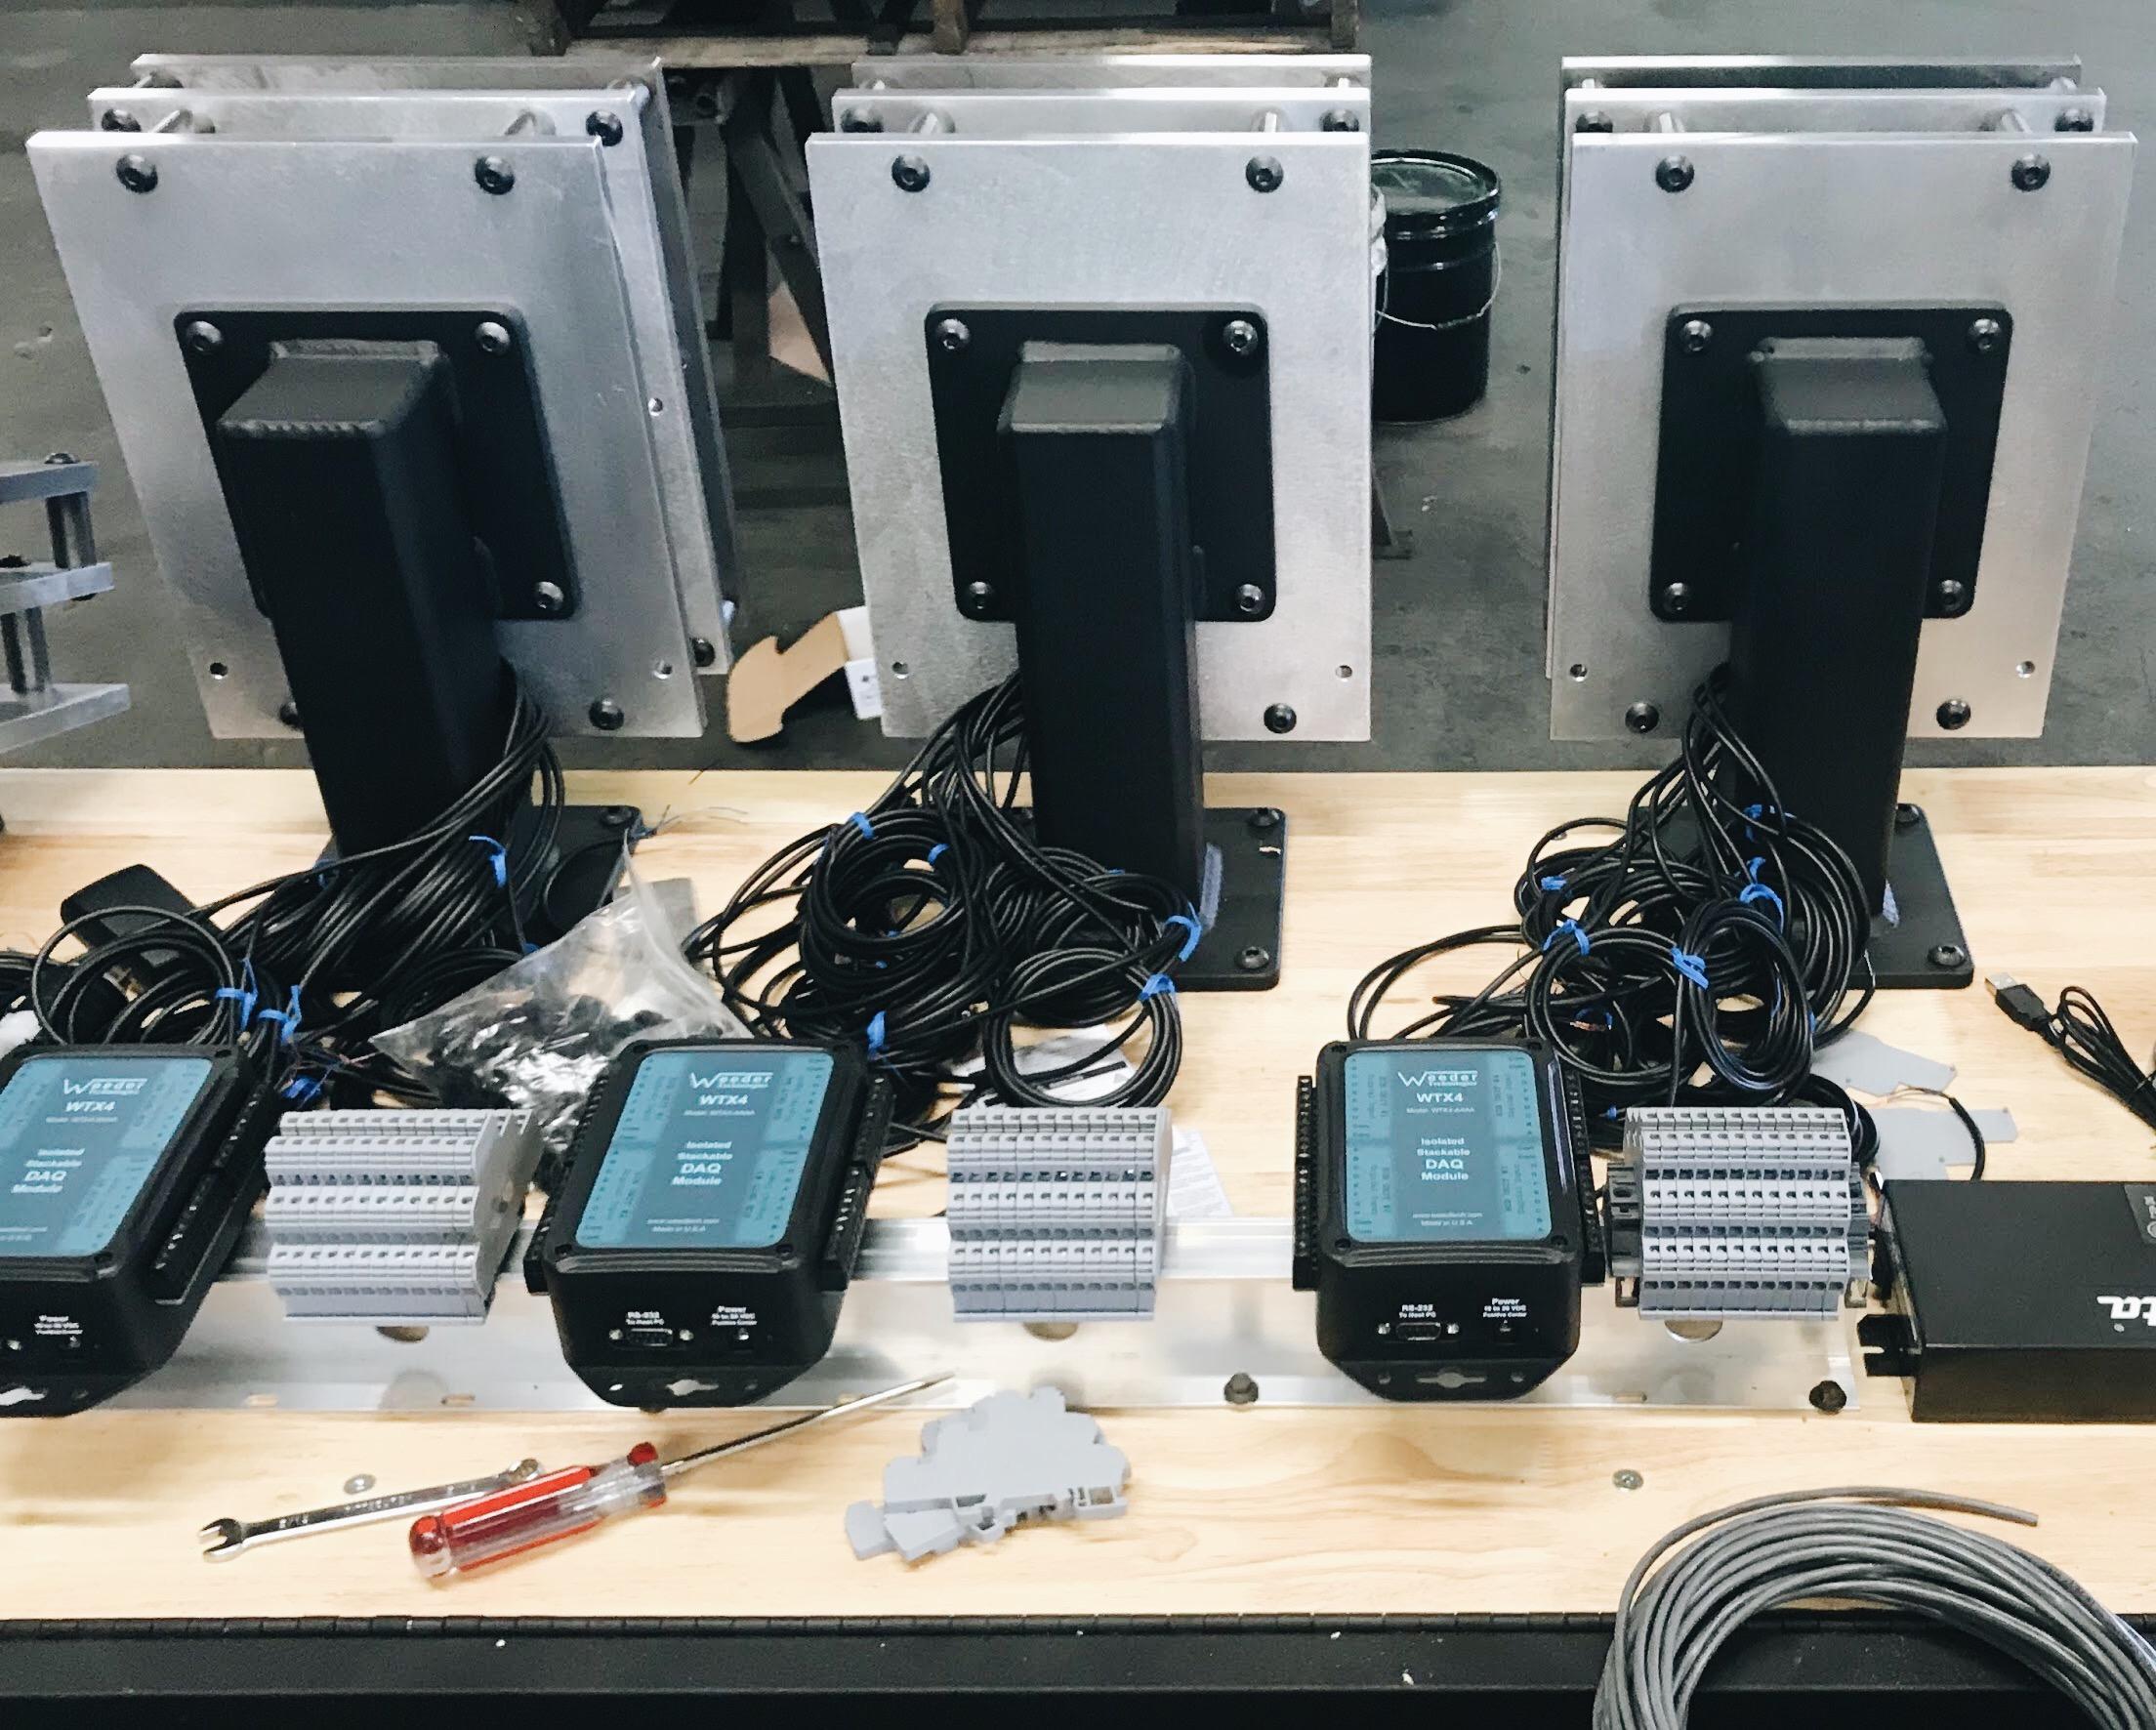 assembly fixtures texas industrial machine & design 9.jpg